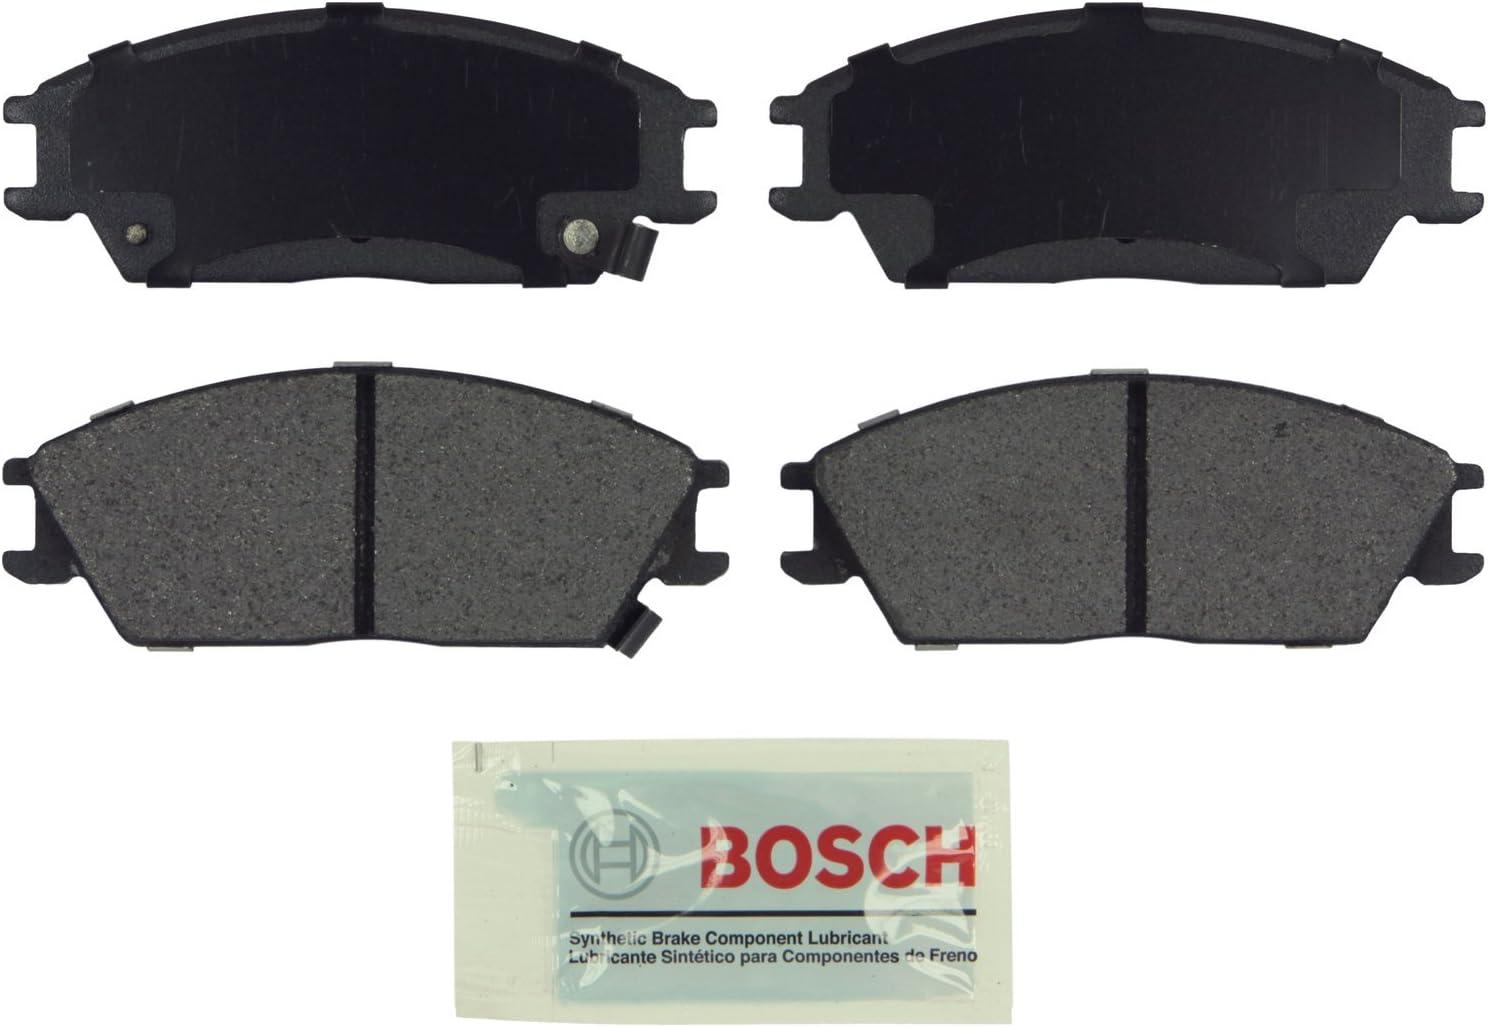 Bosch BE584 Blue Disc Brake Pad Set